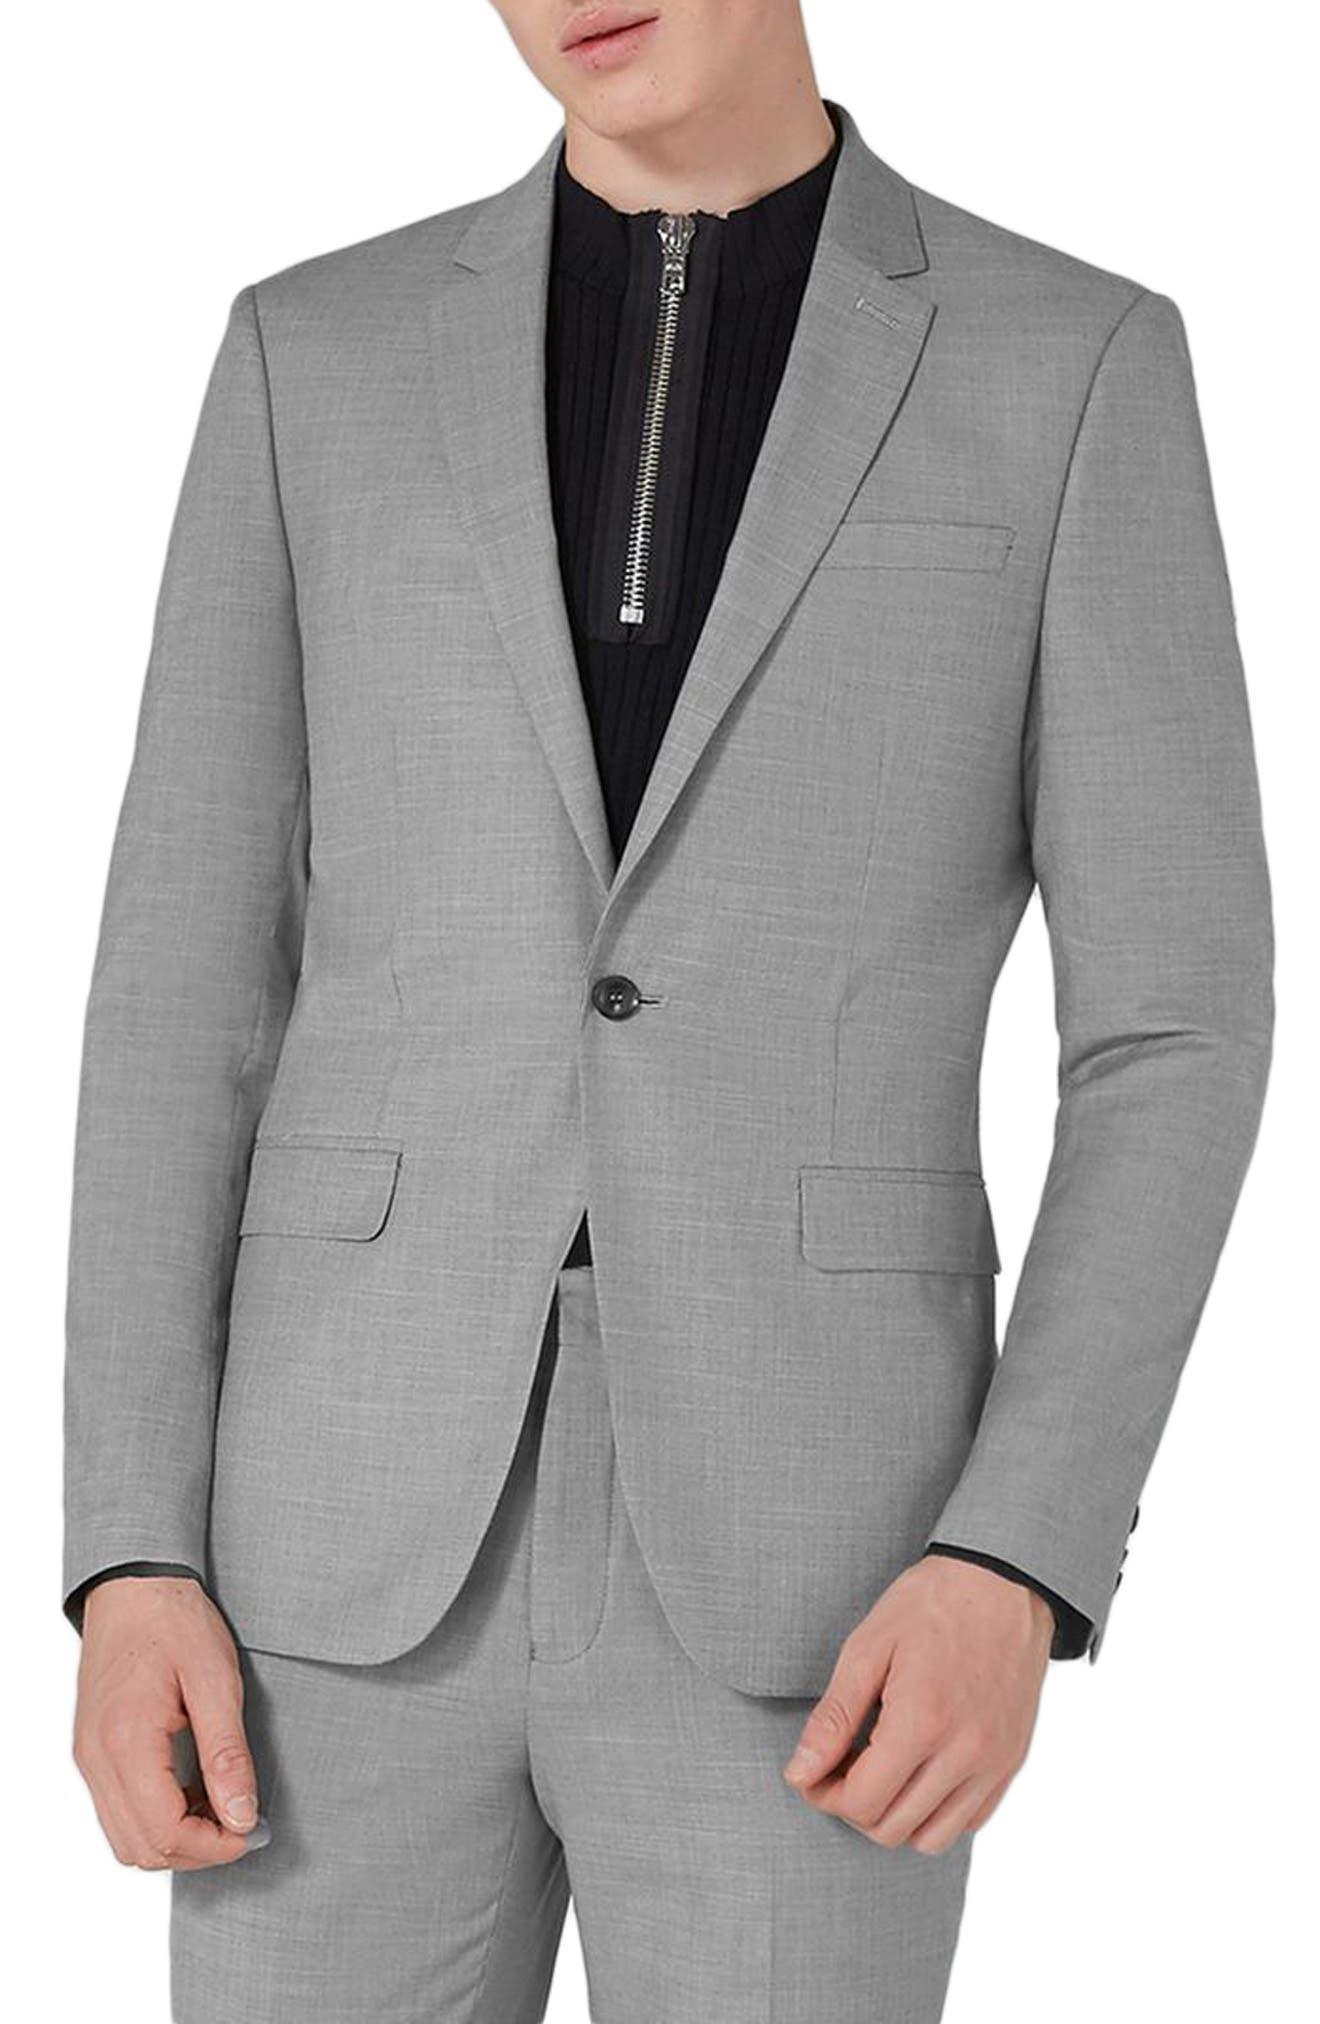 TOPMAN, Skinny Fit Suit Jacket, Main thumbnail 1, color, GREY